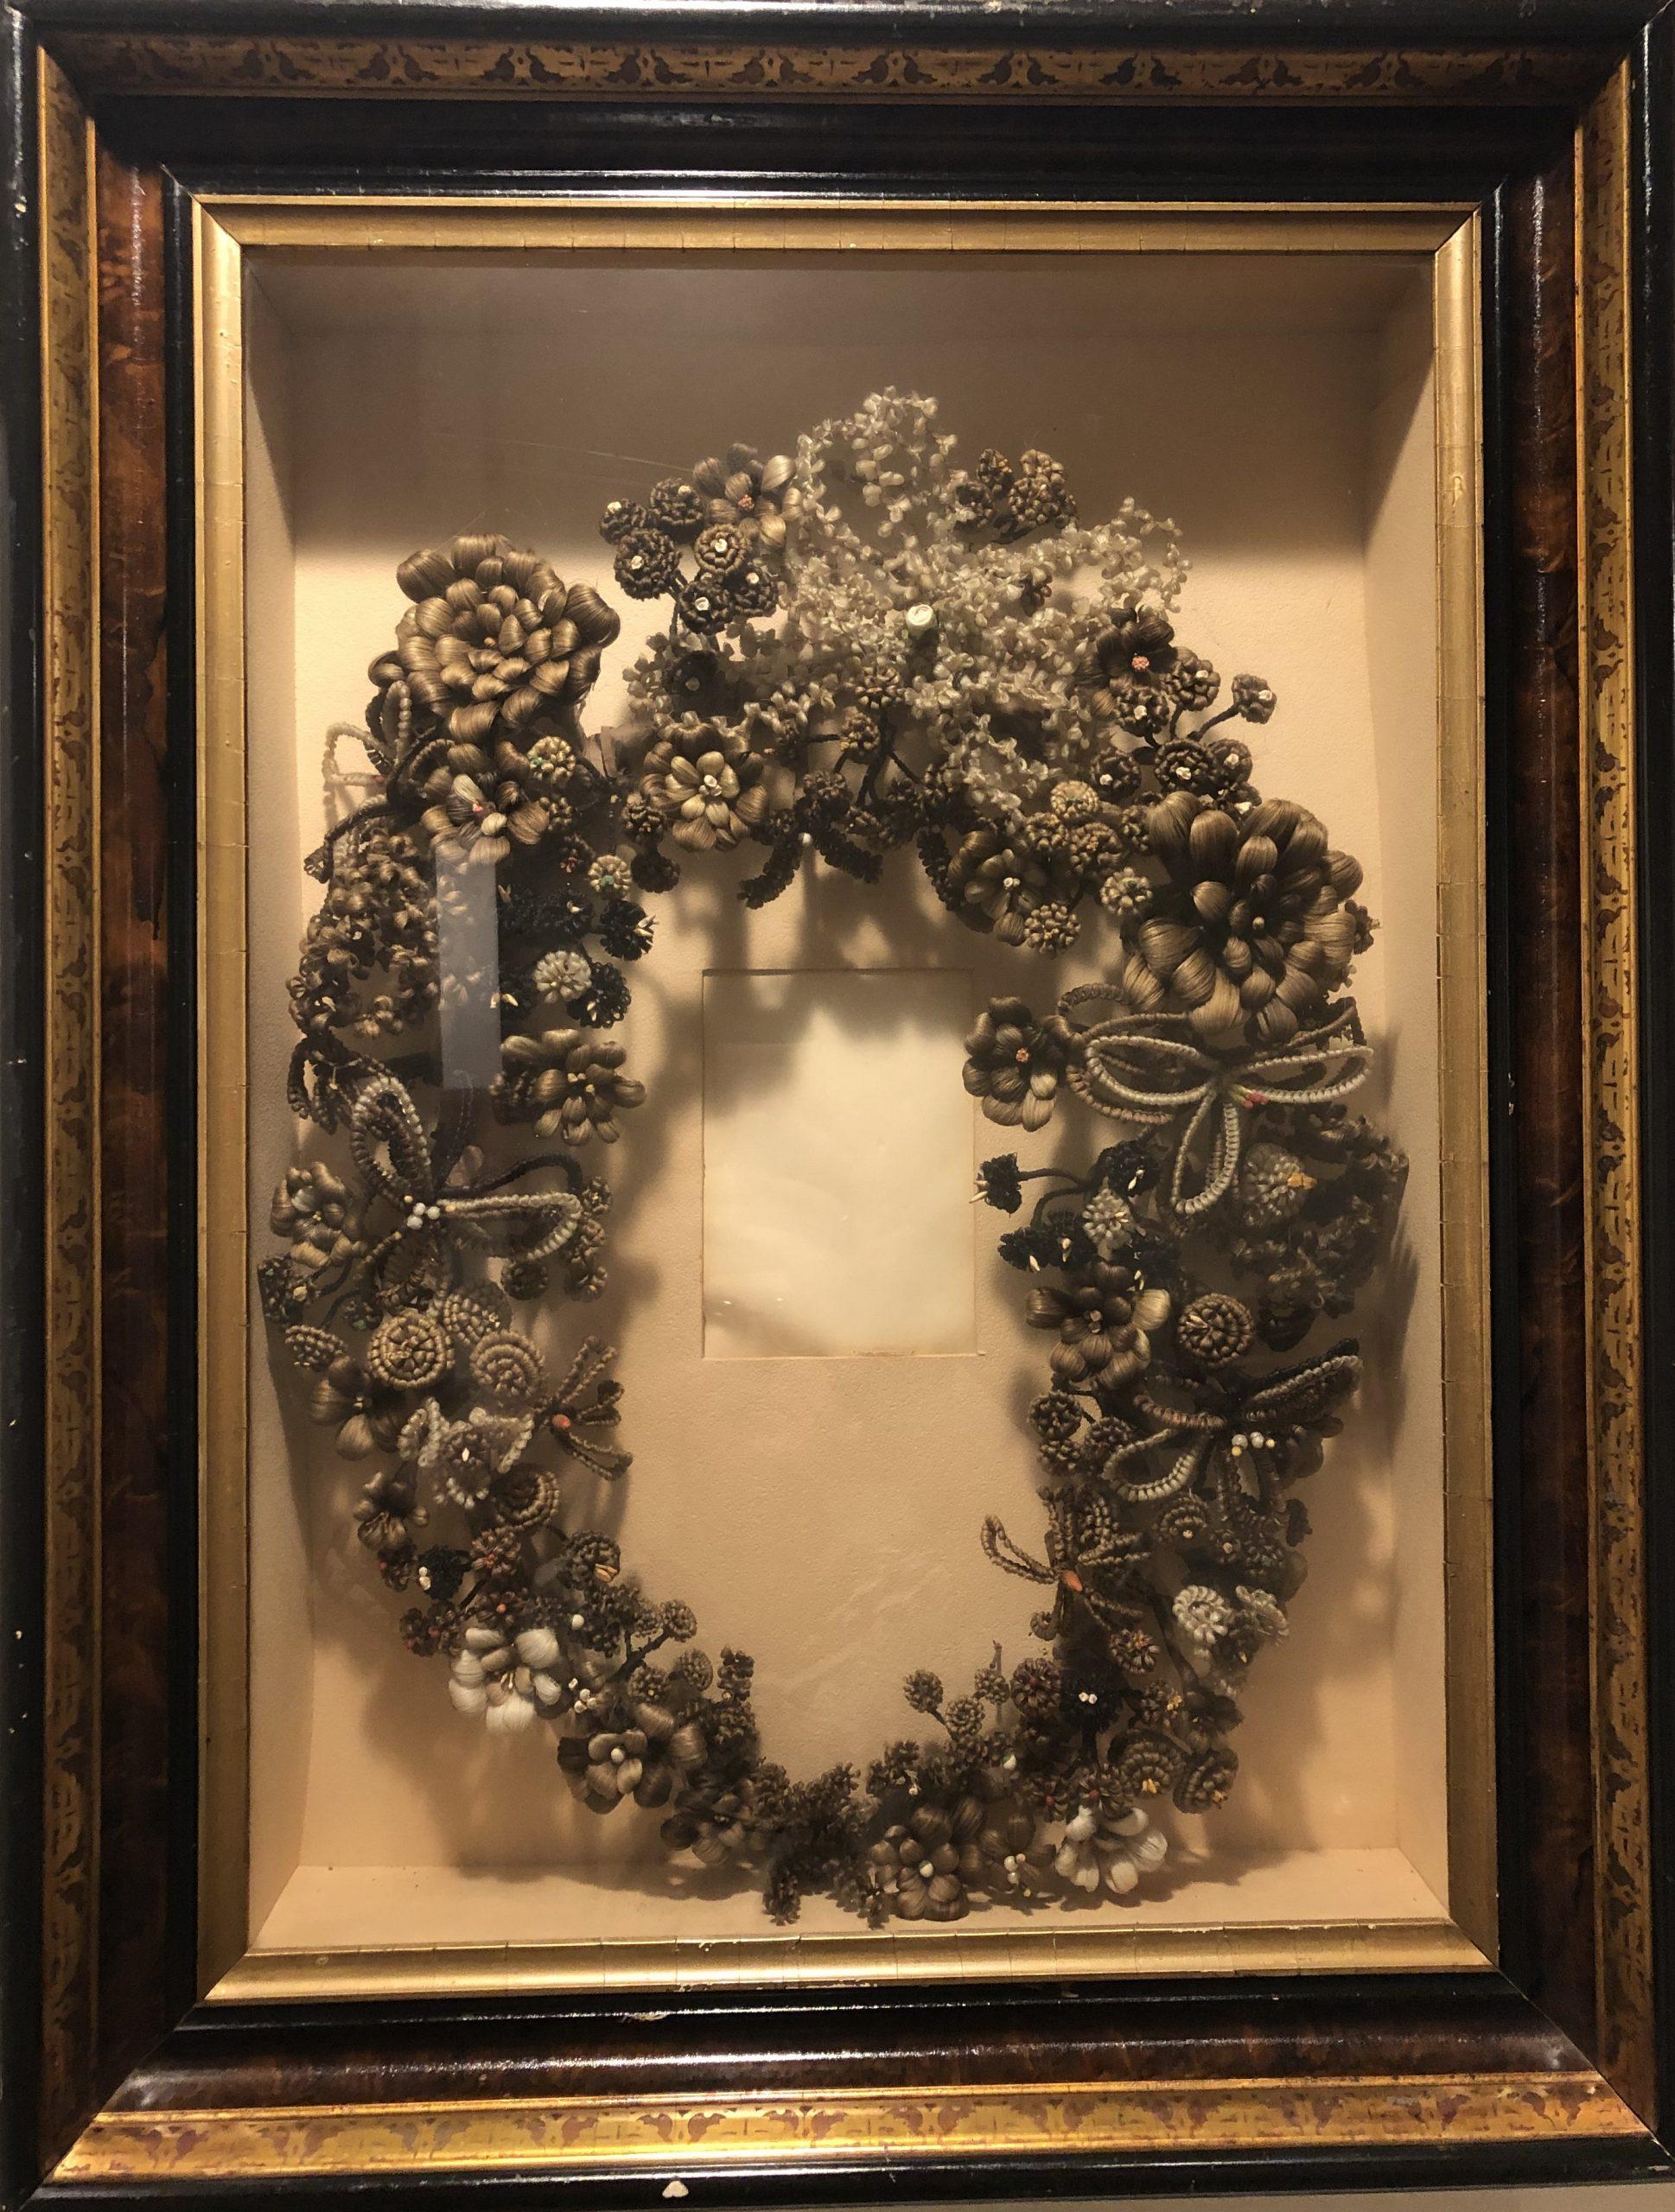 Memorial hairwork wreath on exhibit at The Charles A. Weyerhaeuser Memorial Museum, Little Falls, MN.